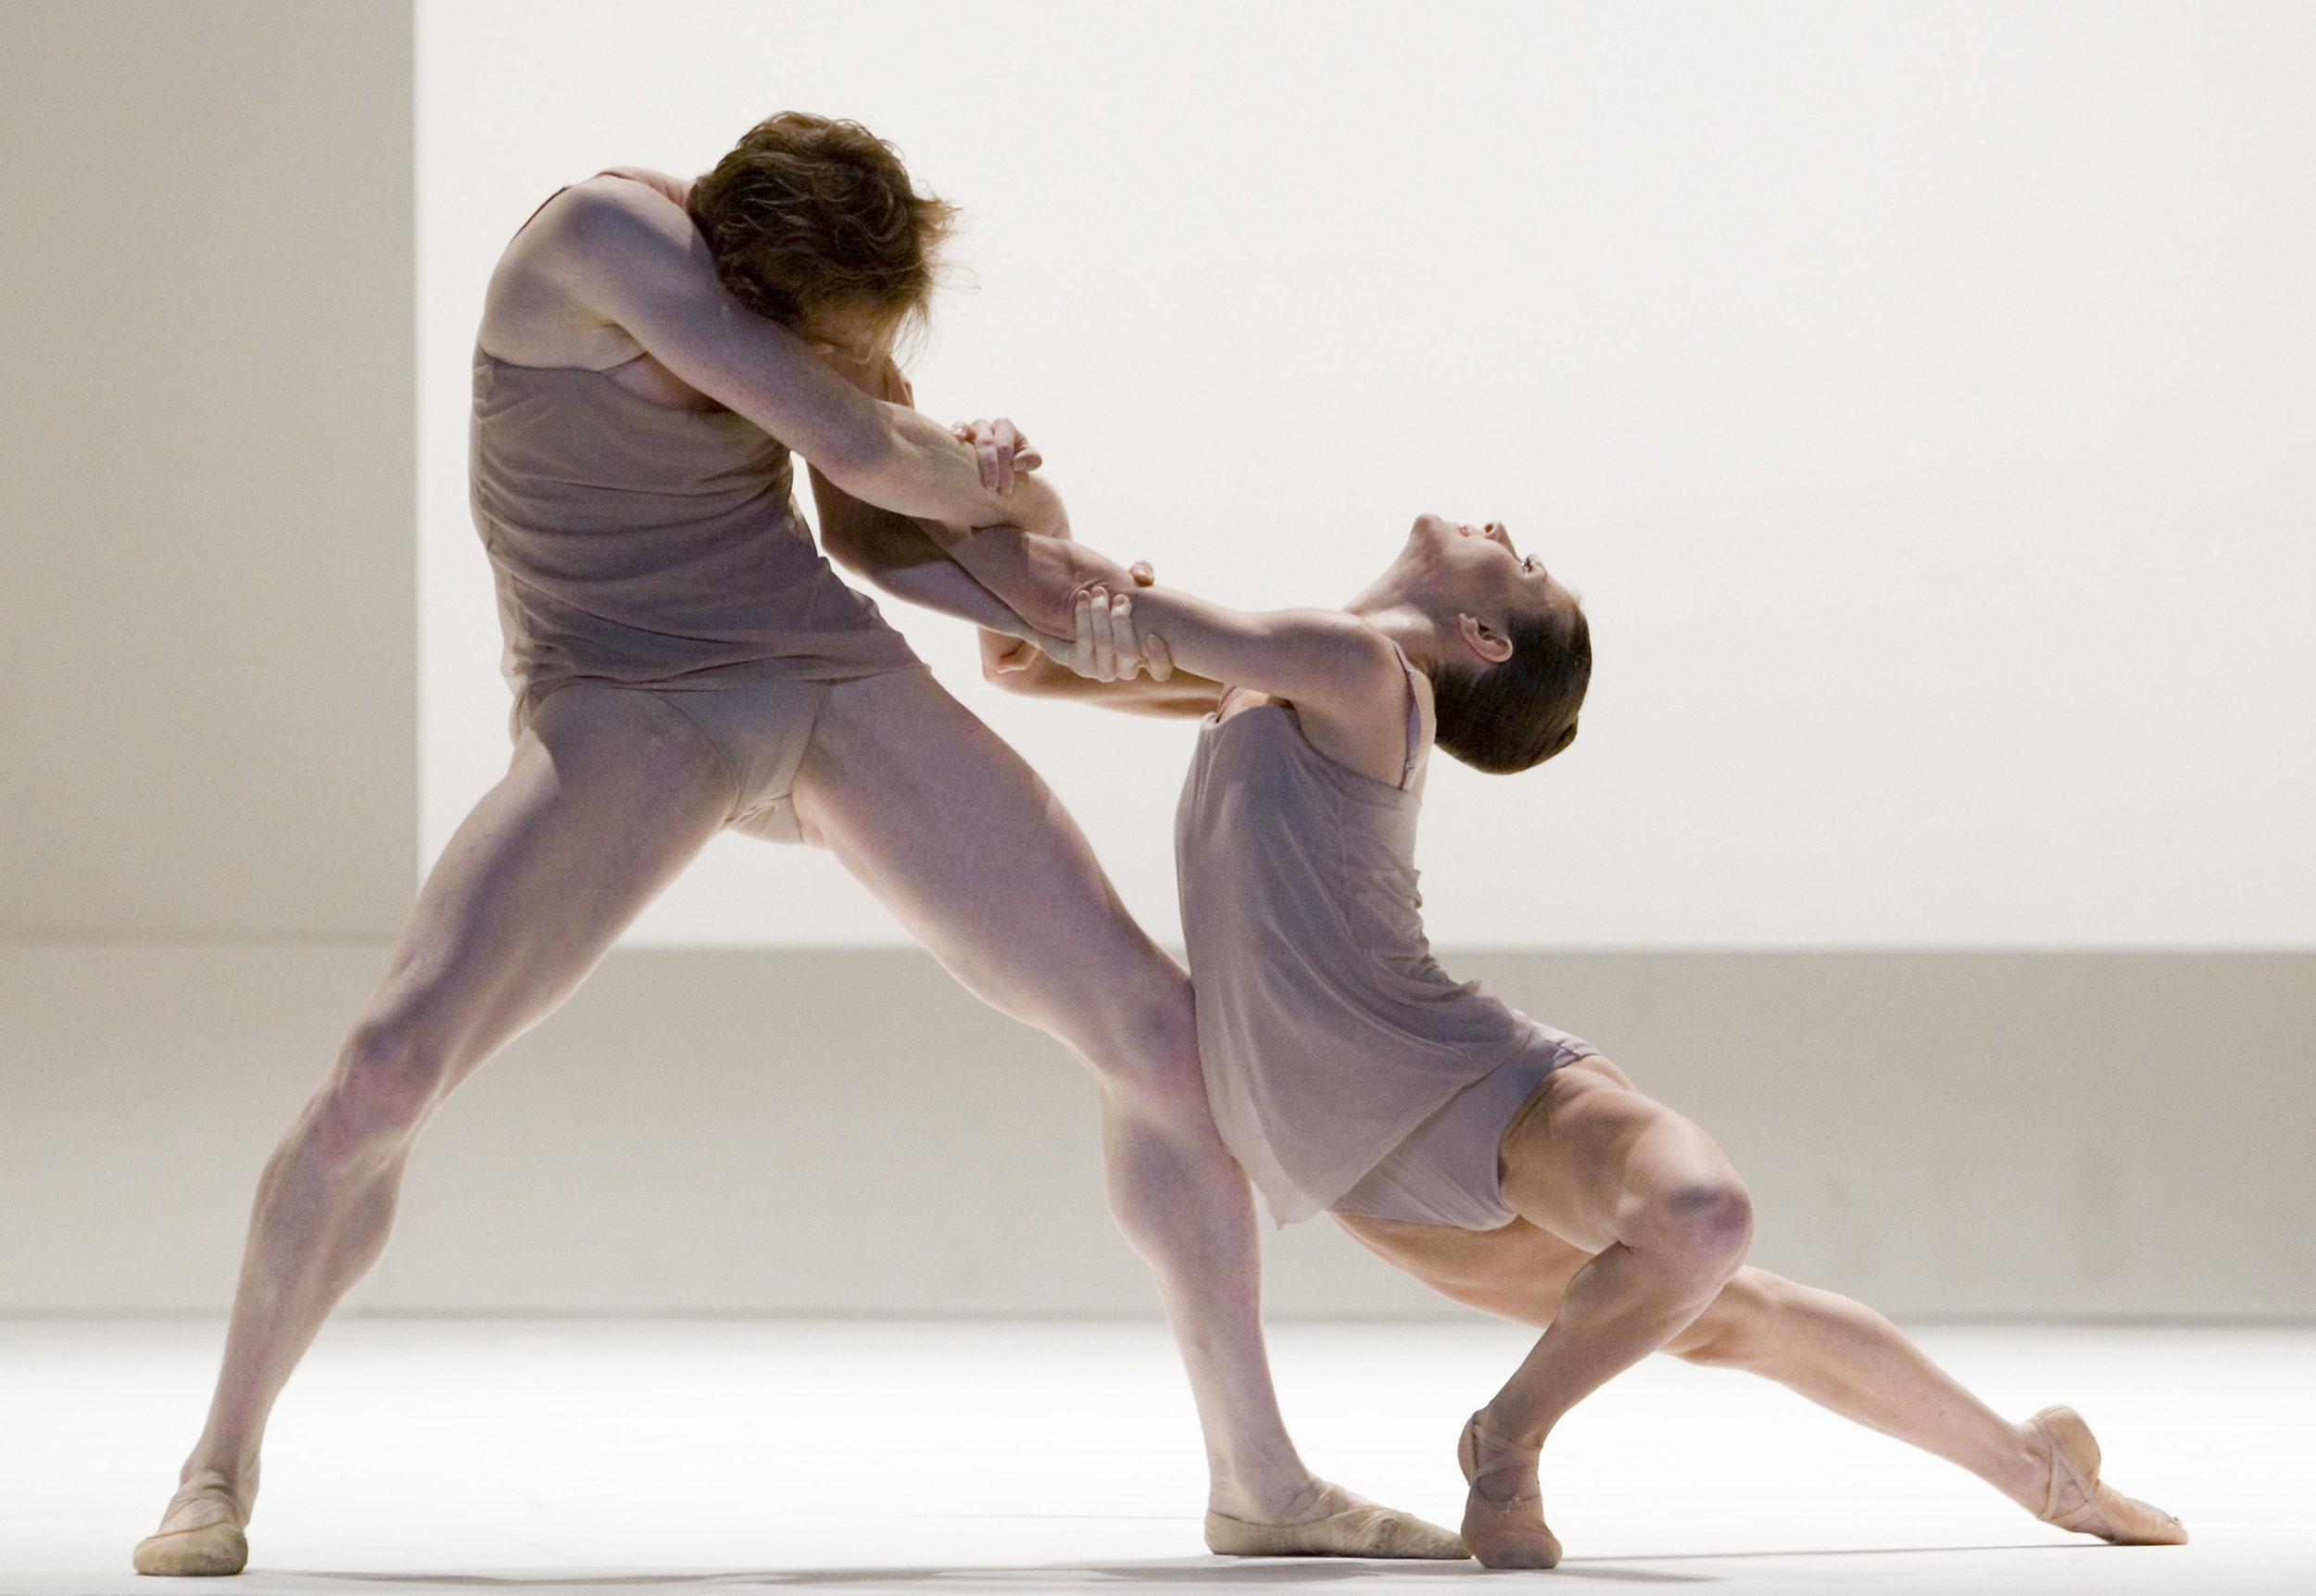 Ed Watson and Mara Galeazzi (Royal Ballet)in Wayne McGregor's 'Chroma'